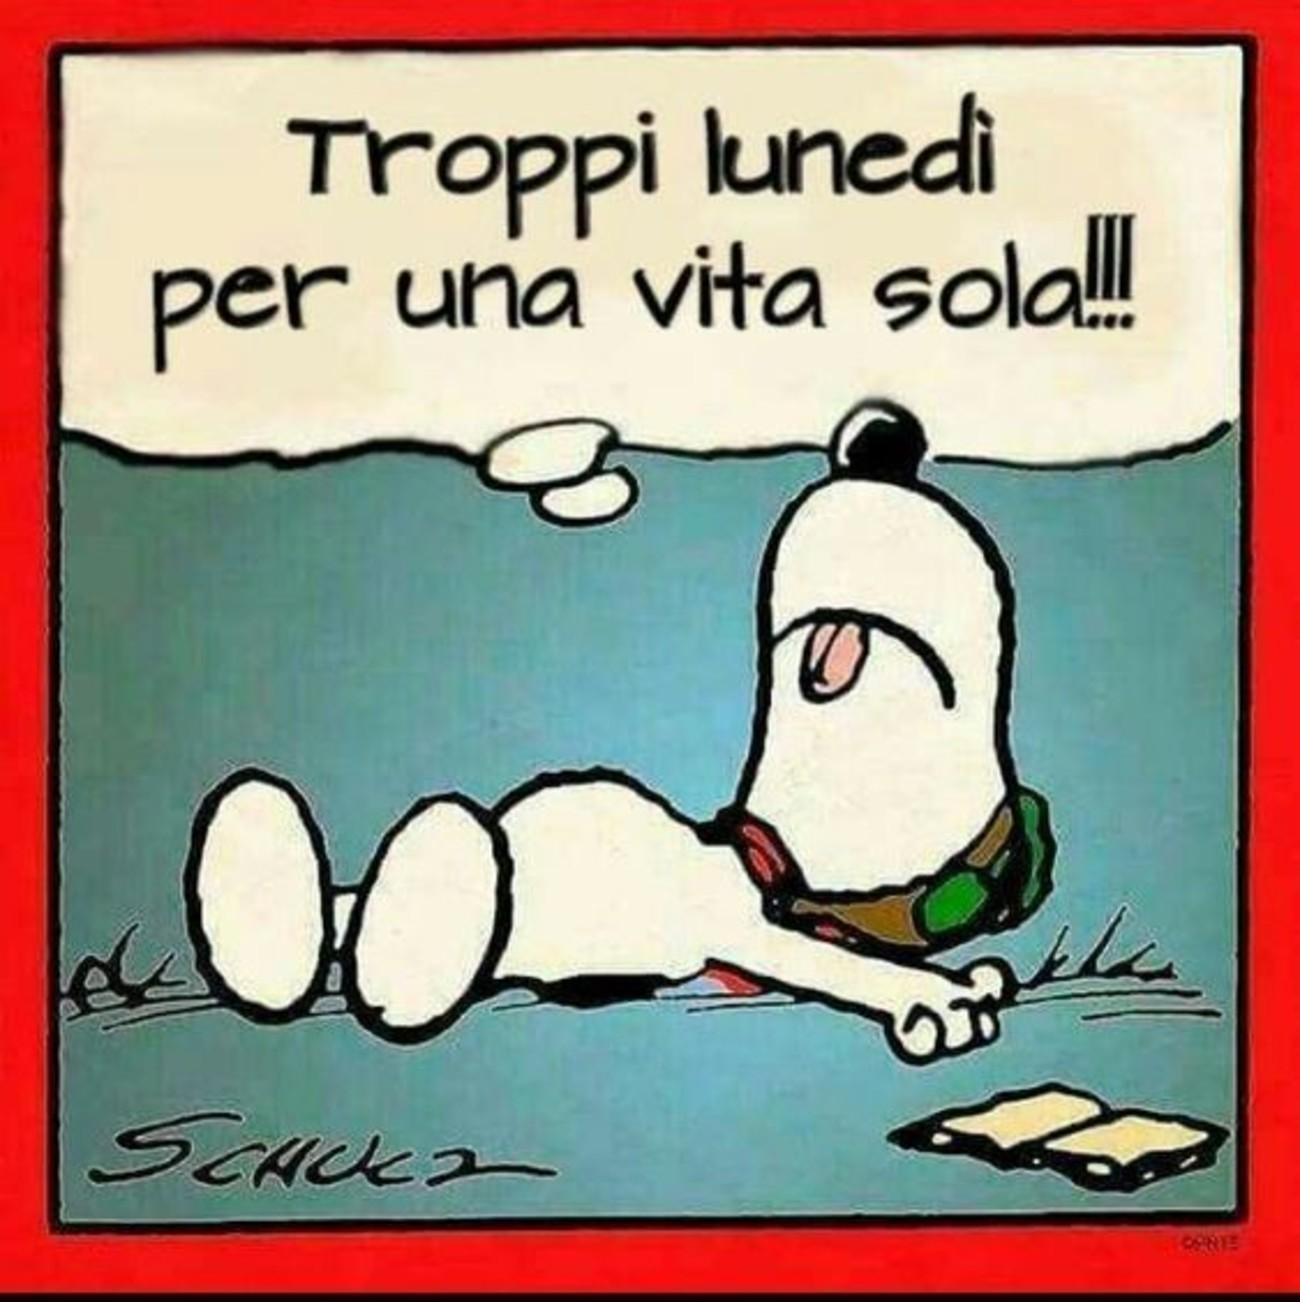 Troppi Lunedì per una vita sola Snoopy